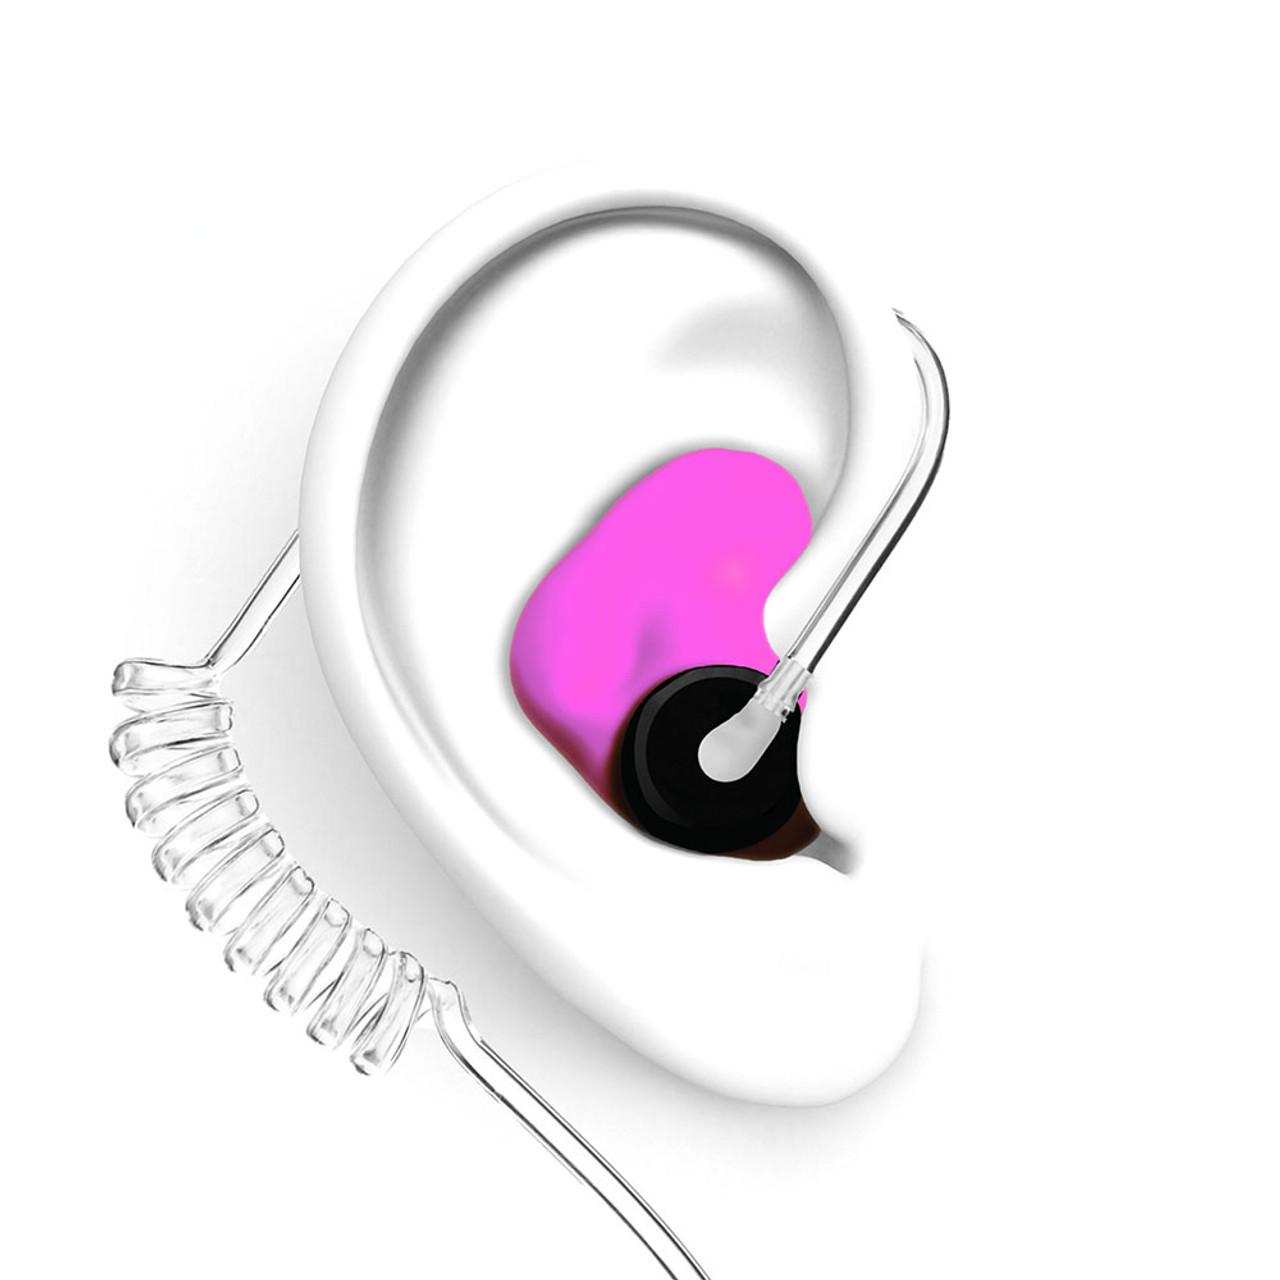 DECIBULLZ Pink Custom Earplug for Two Way Radio Headsets